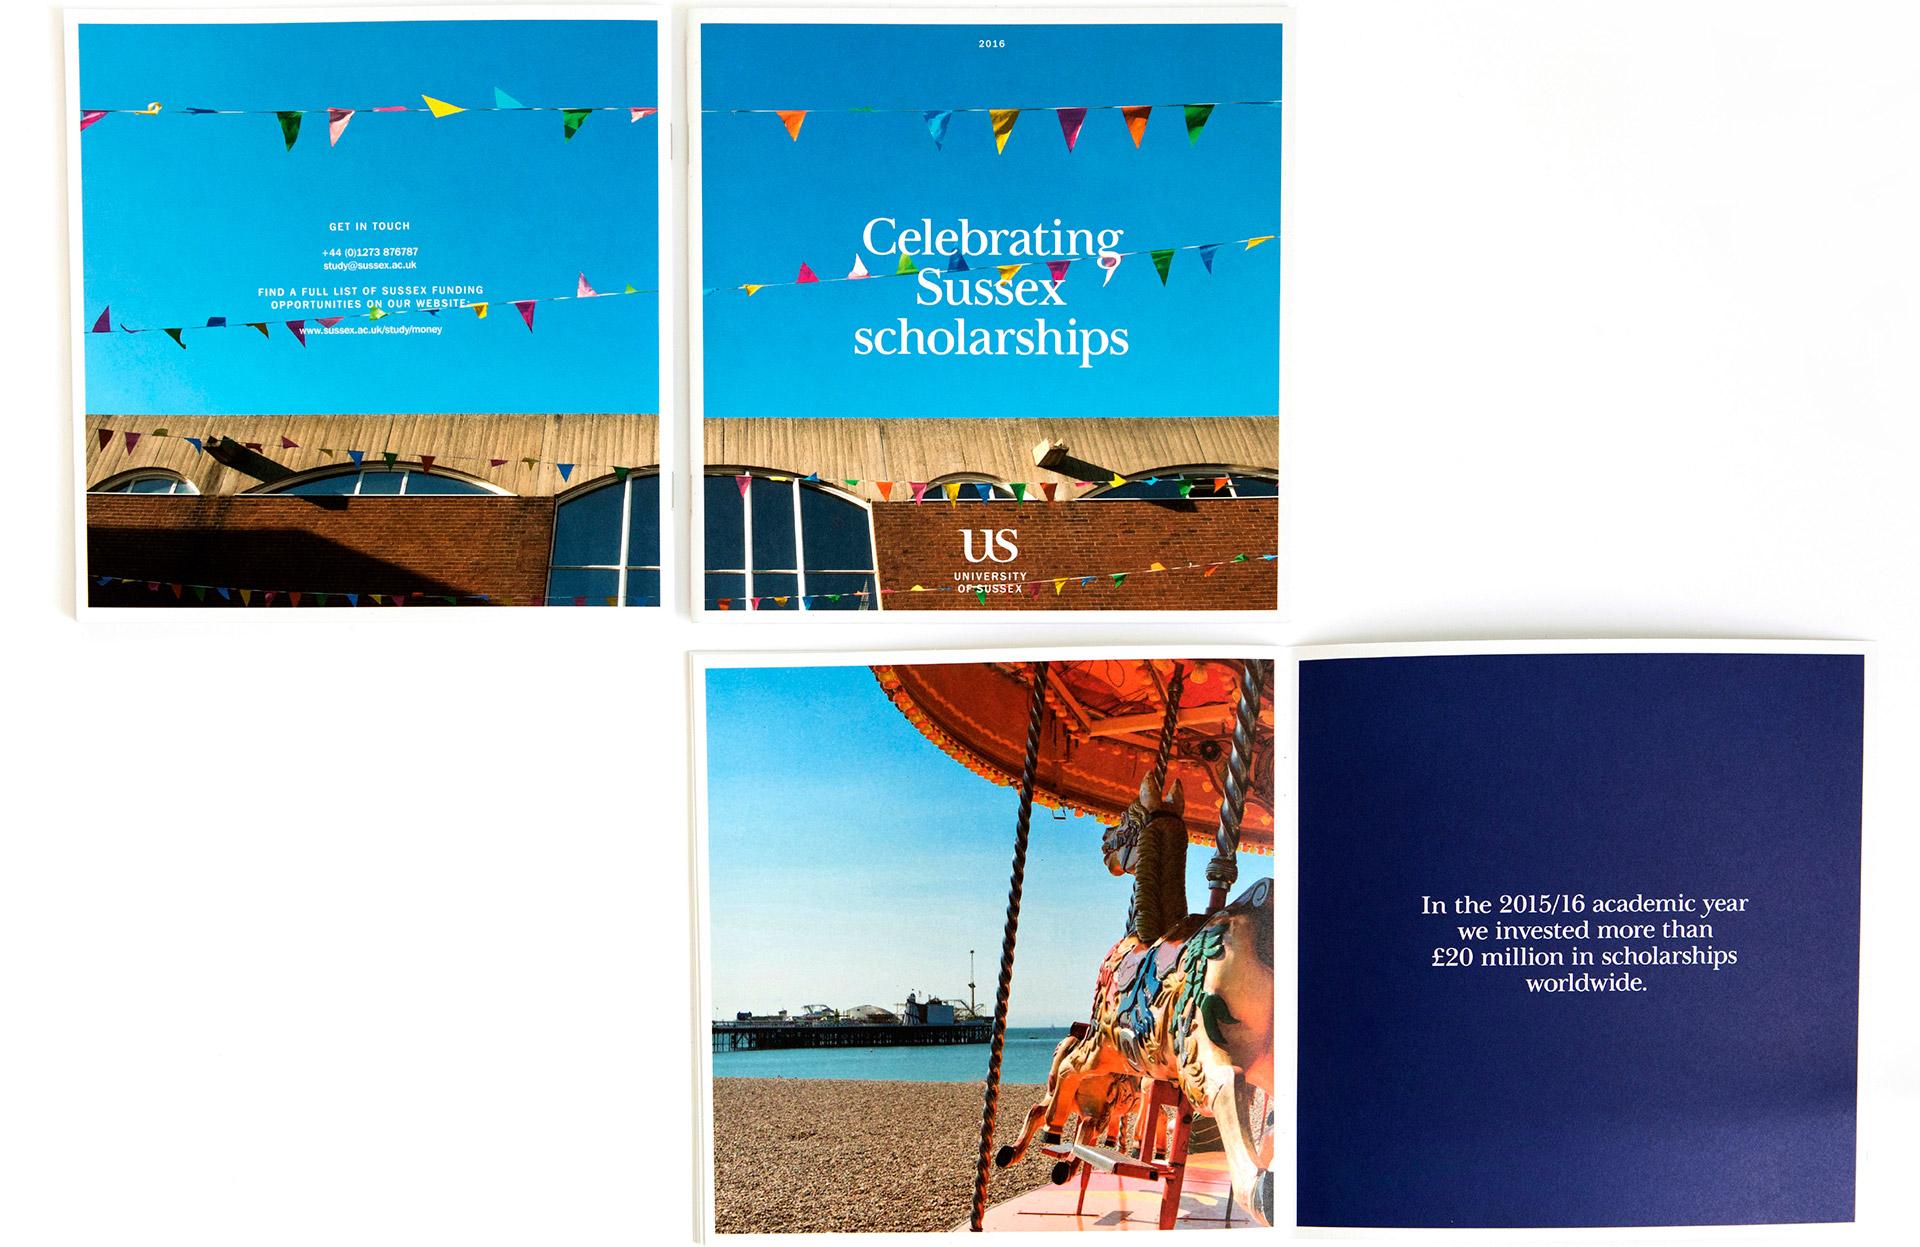 The University of Sussex Scholarship brochure designed by Irish Butcher